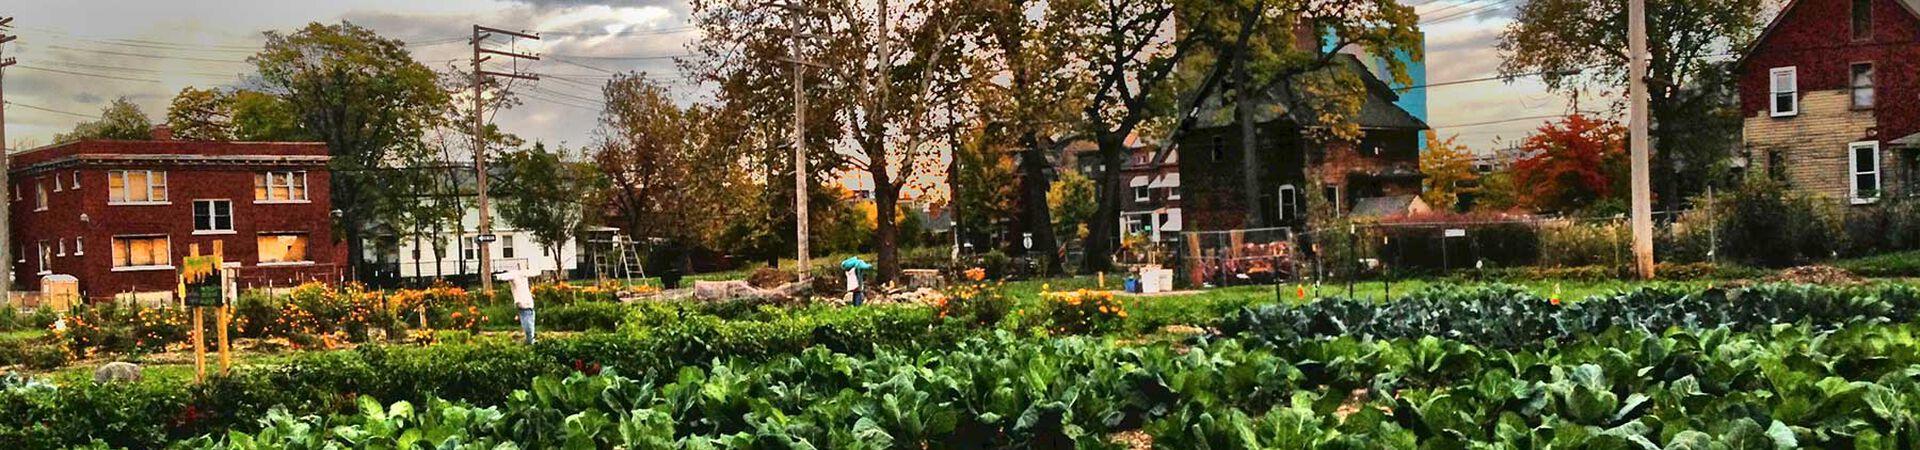 Banner - Michigan Urban Farming Initiative